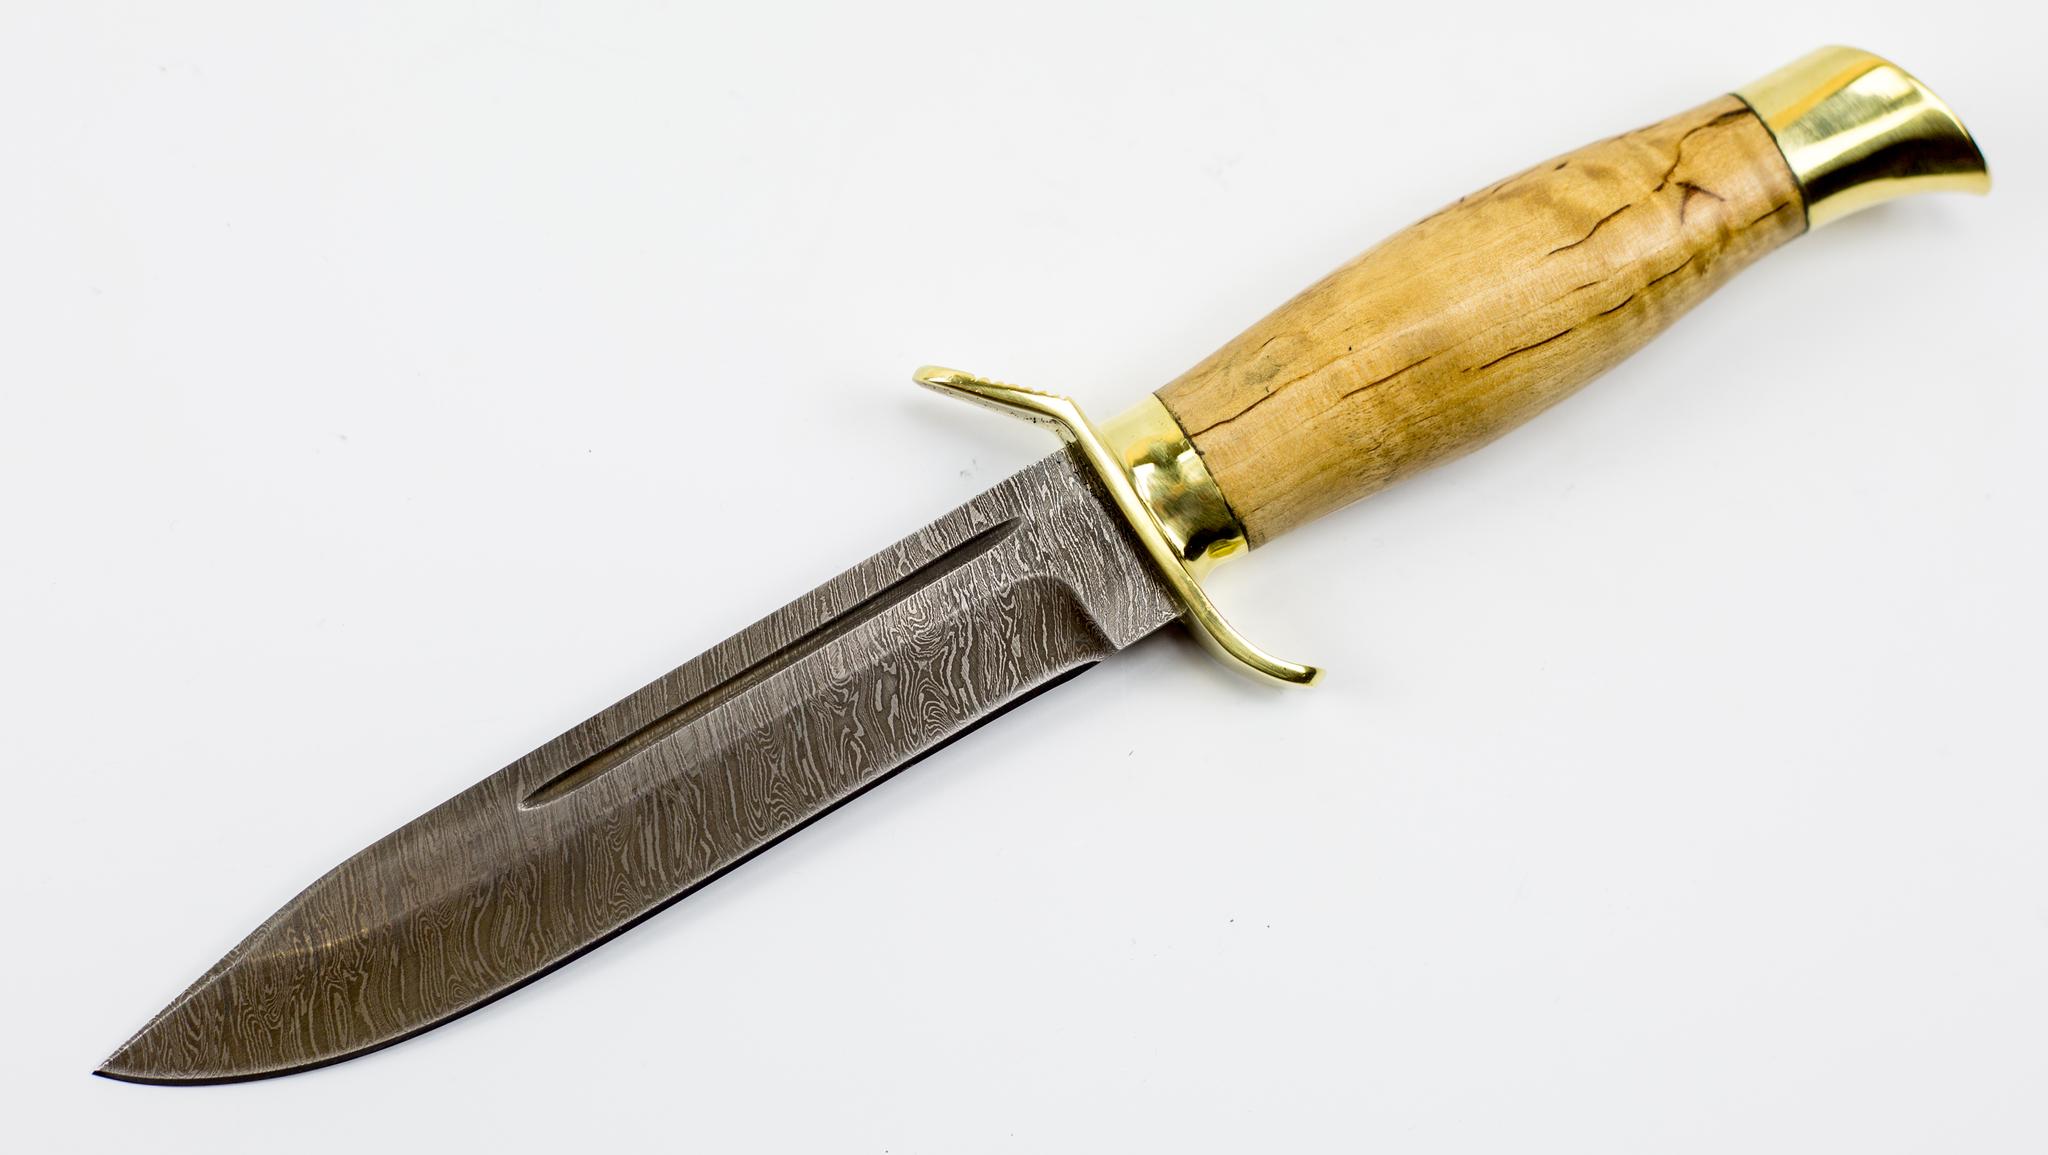 Нож НР-40 дамаск, карельская береза нож панцуй cpm 20cv карельская береза зеленый